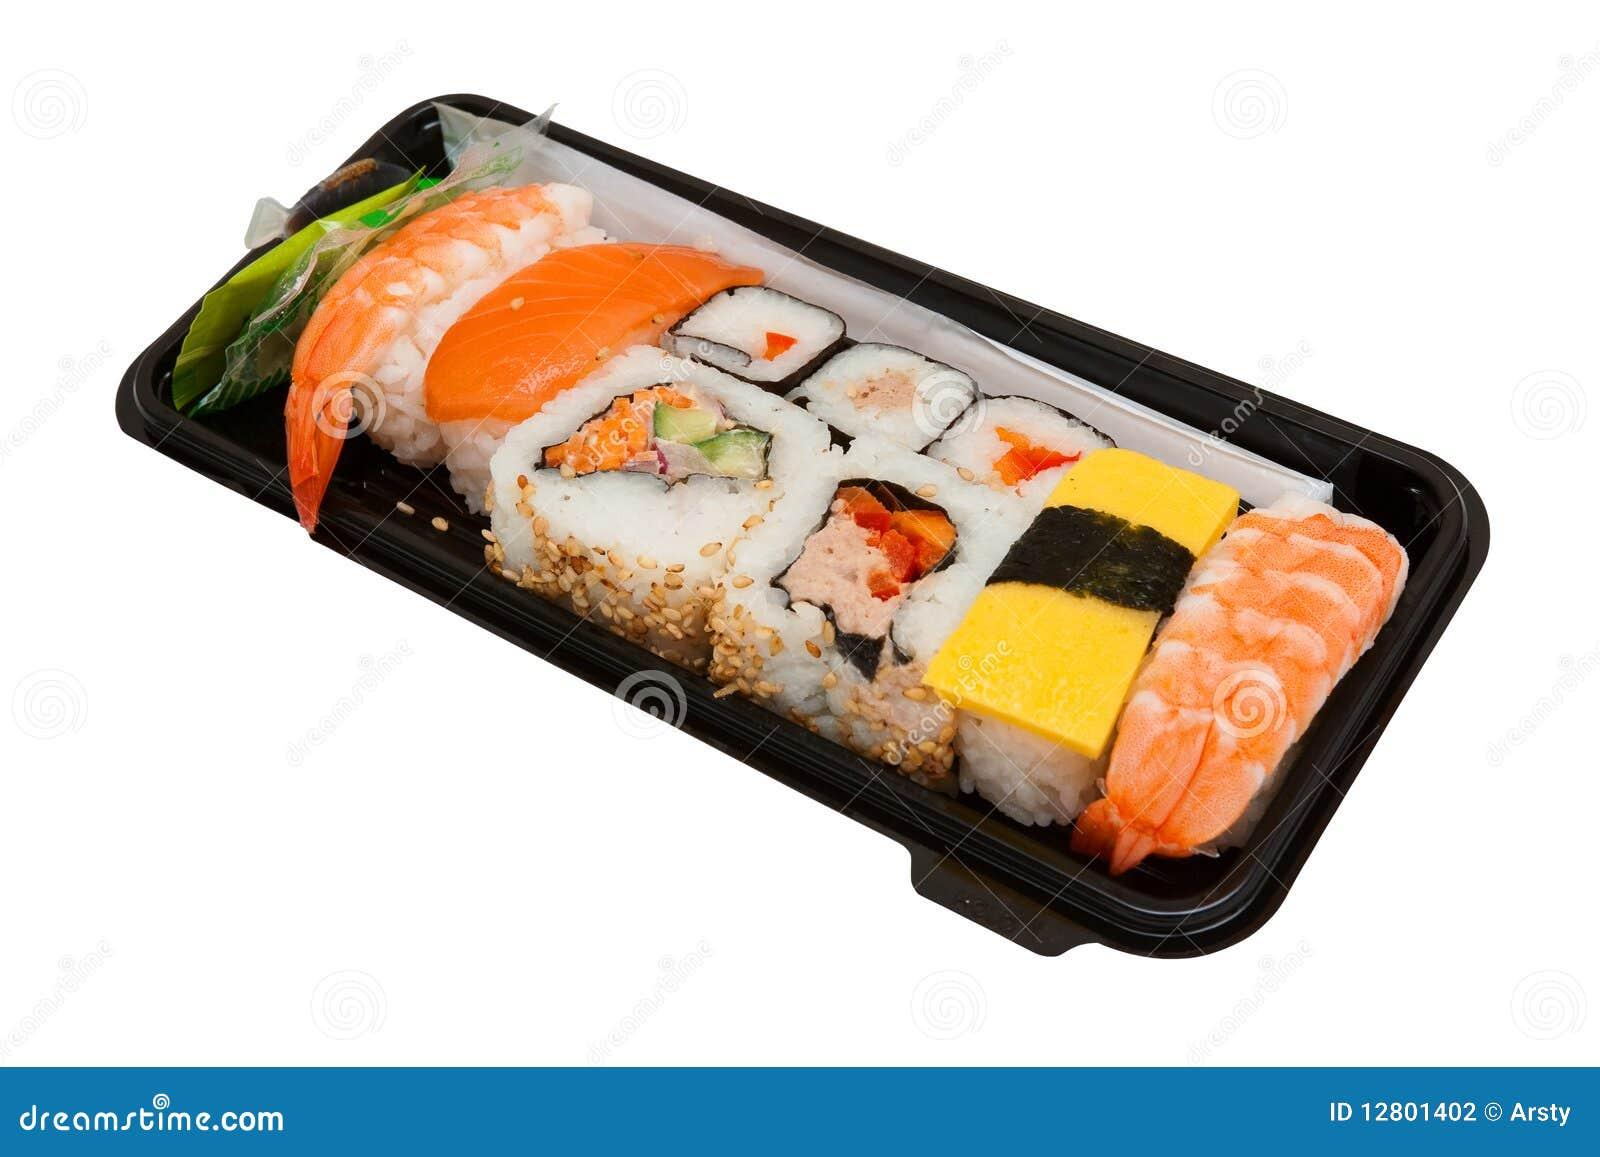 set of sushi stock photography image 12801402. Black Bedroom Furniture Sets. Home Design Ideas